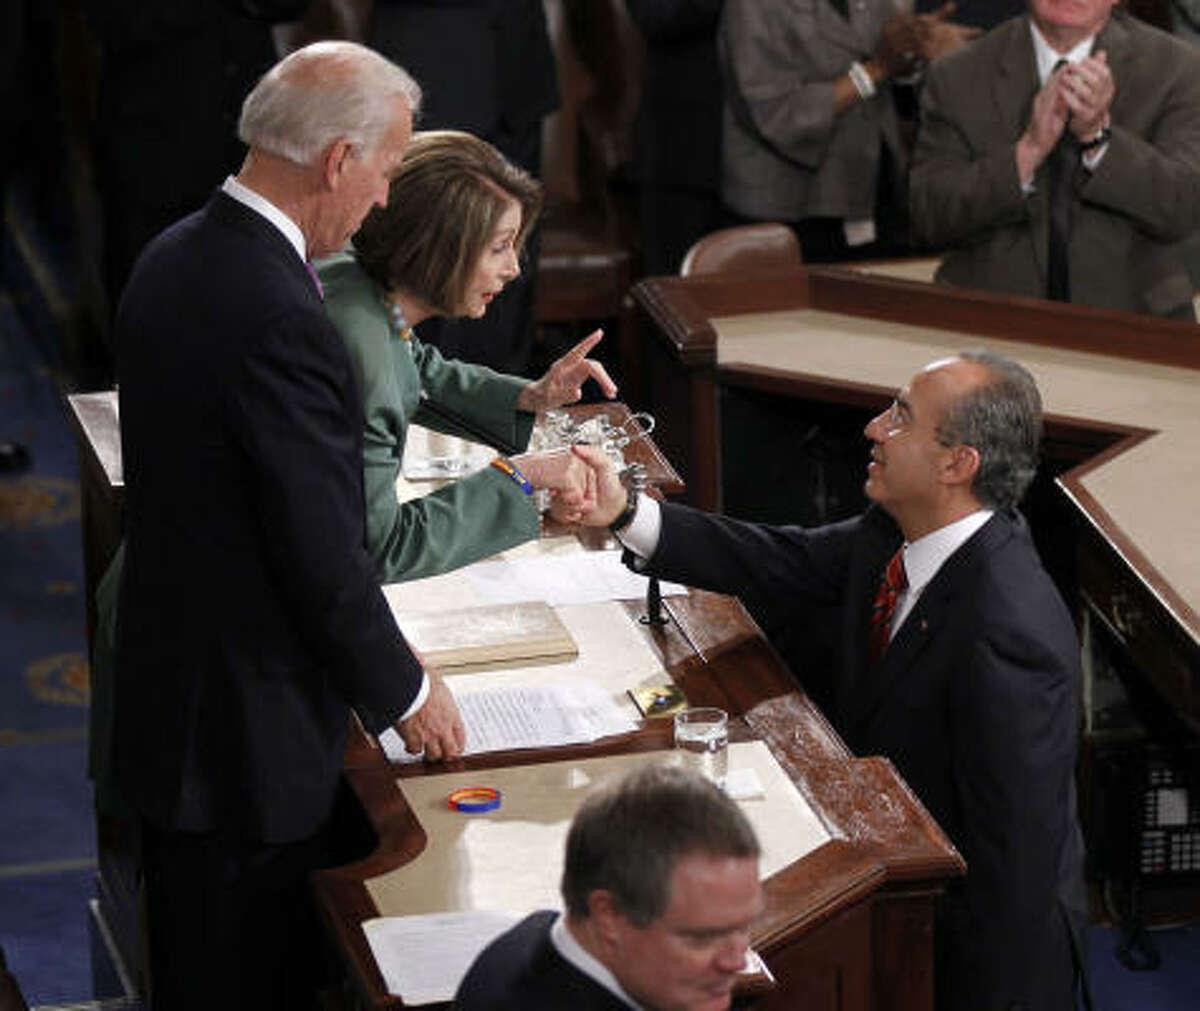 Vice President Joe Biden and Speaker Nancy Pelosi greet Mexican President Felipe Calderón before his address.